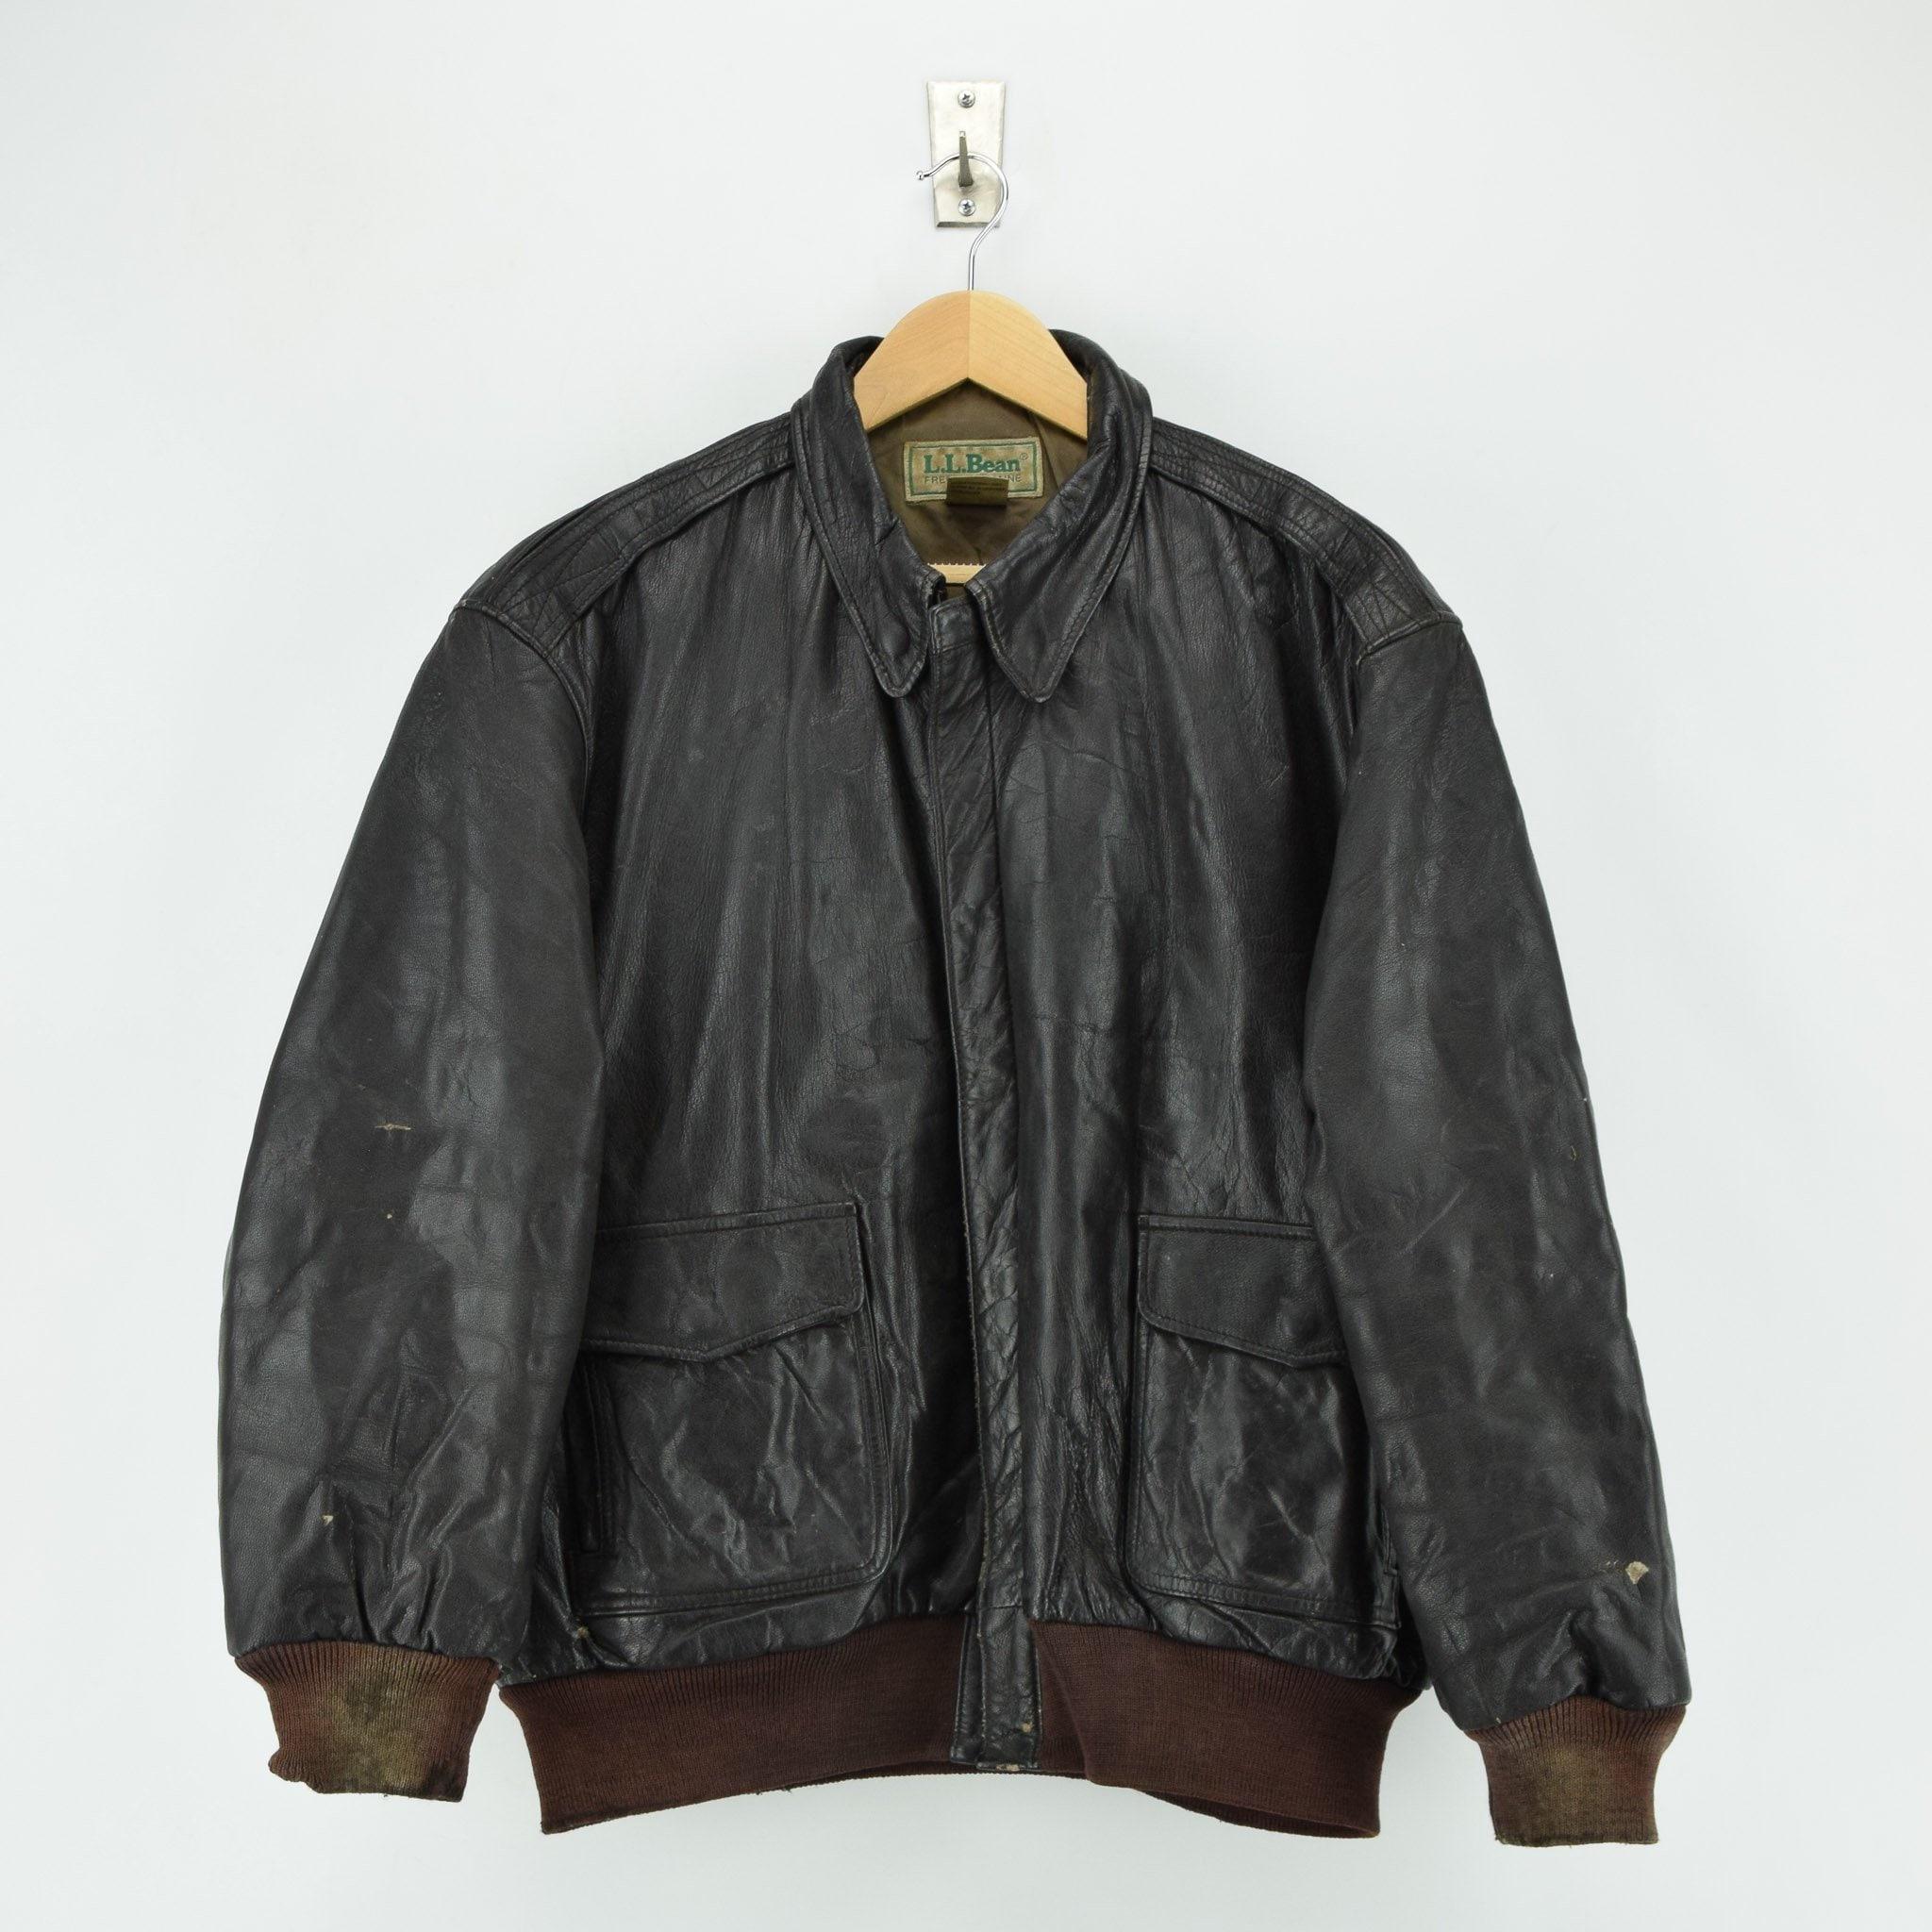 ee80ad60e Vintage LL Bean A-2 Brown Leather Flight Bomber Jacket USA Made Talon Zip XL